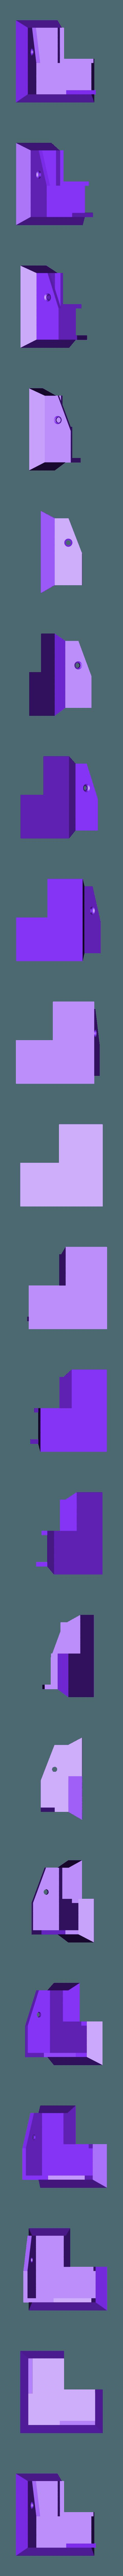 pied profil 20 20 por devidoir sans equerre.stl Download STL file foot profile 20/20 • 3D print model, ced57